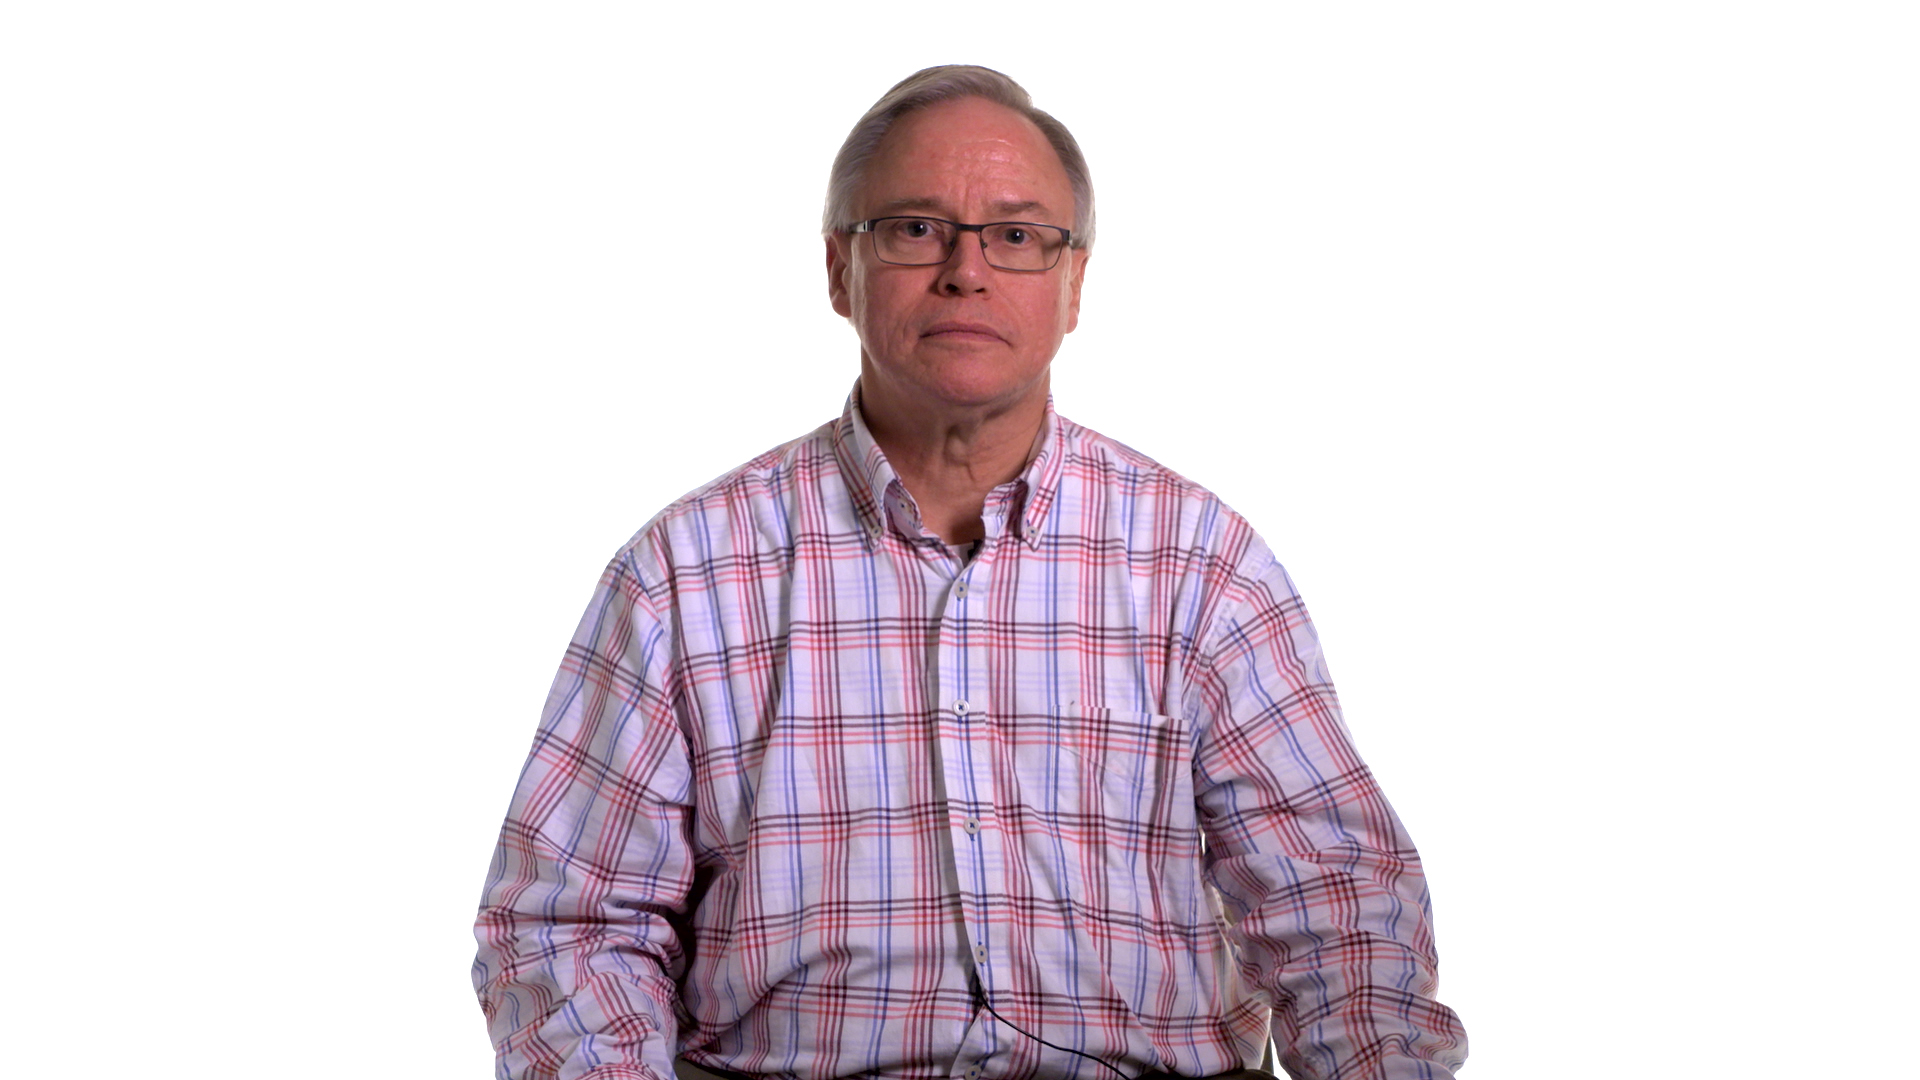 Craig Eastman